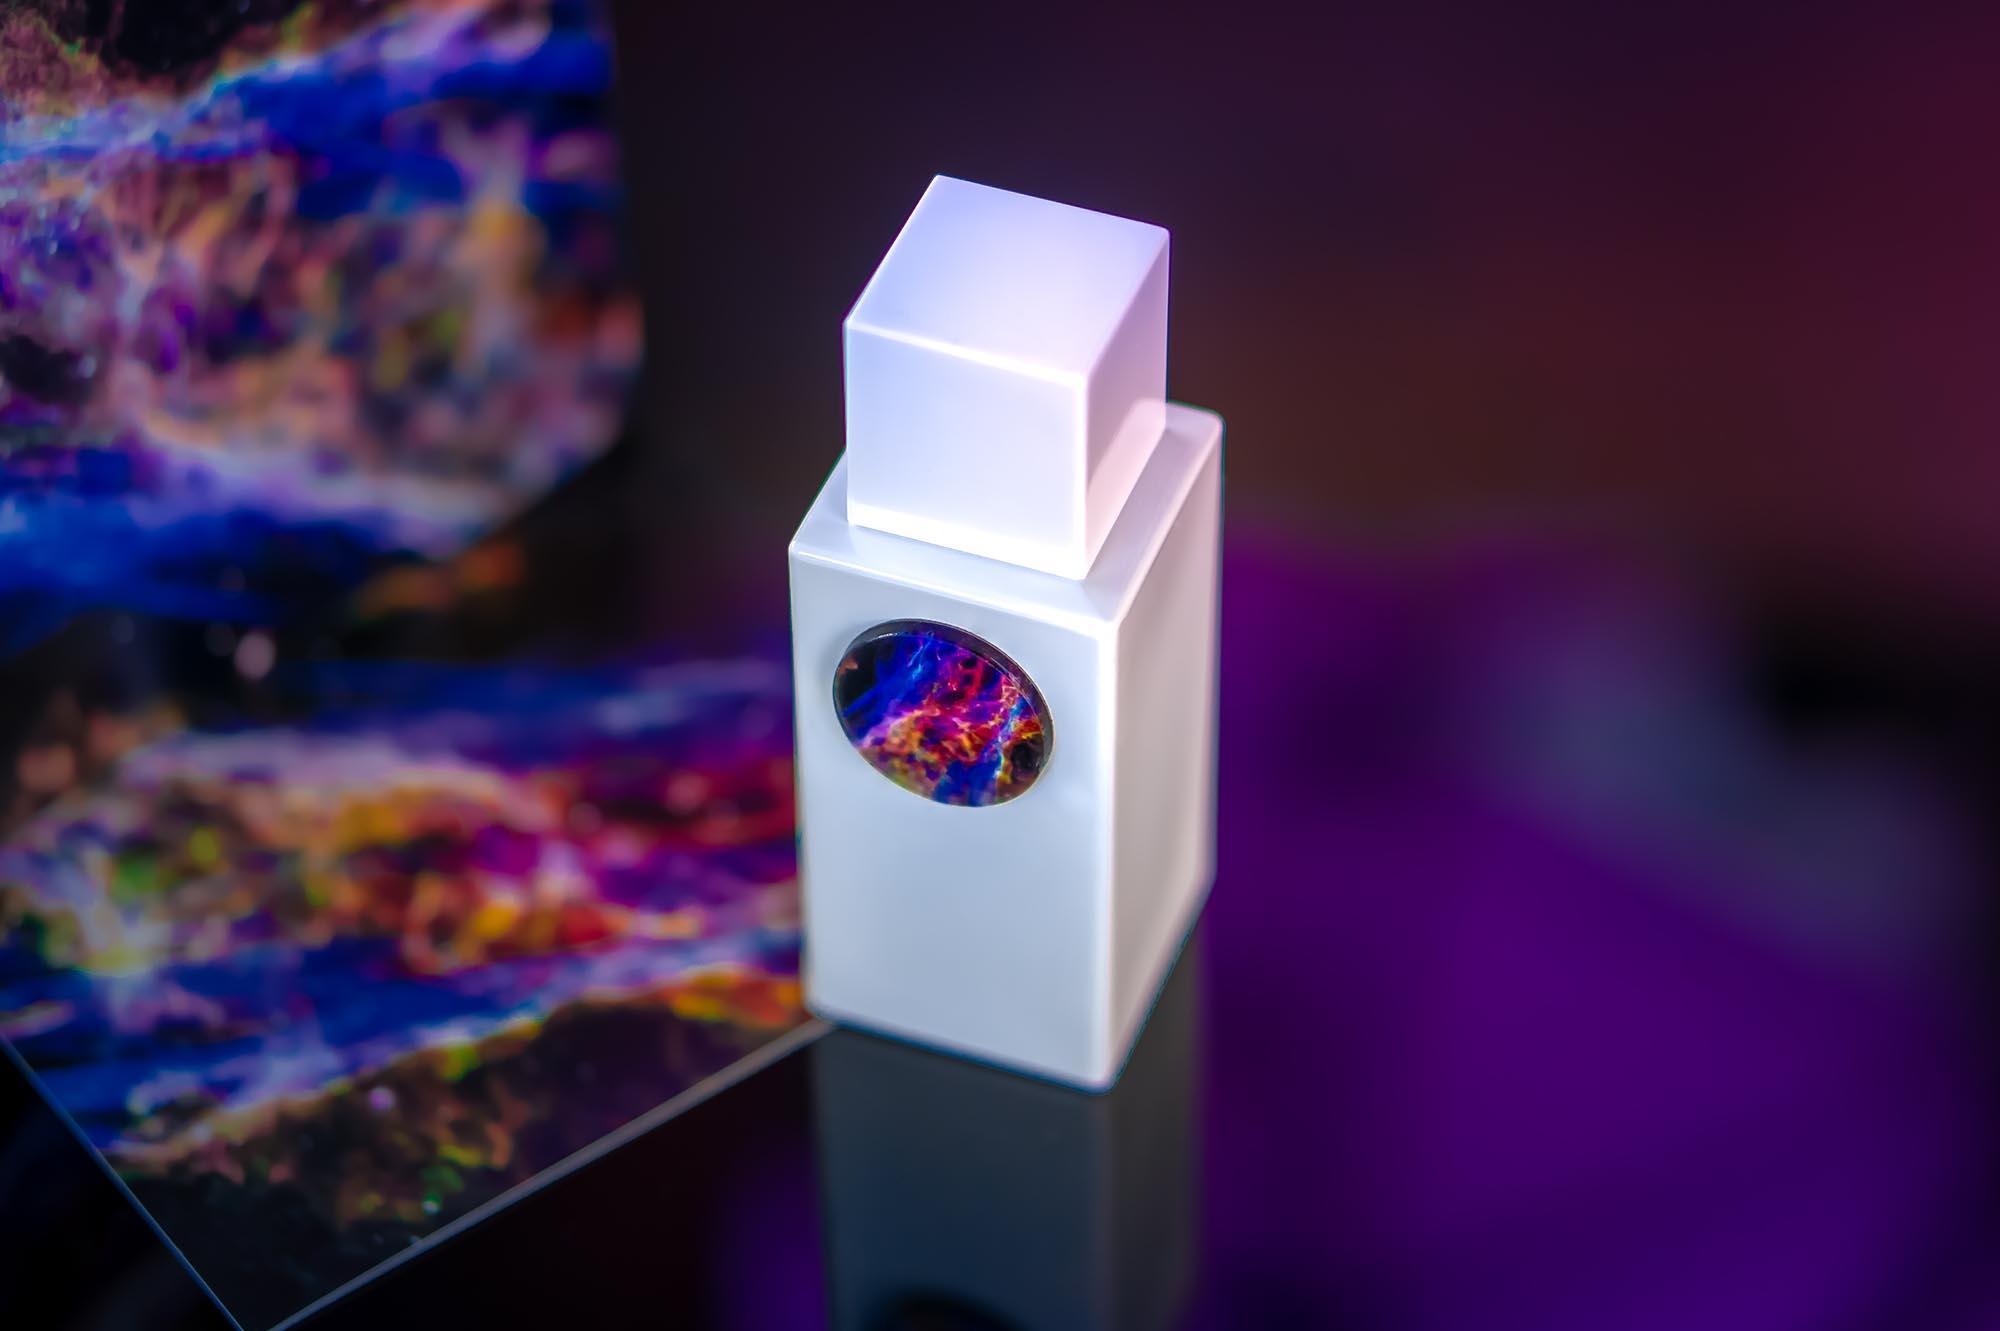 Duft des Sternennebels: VEIL von Oliver & Co. Perfumes